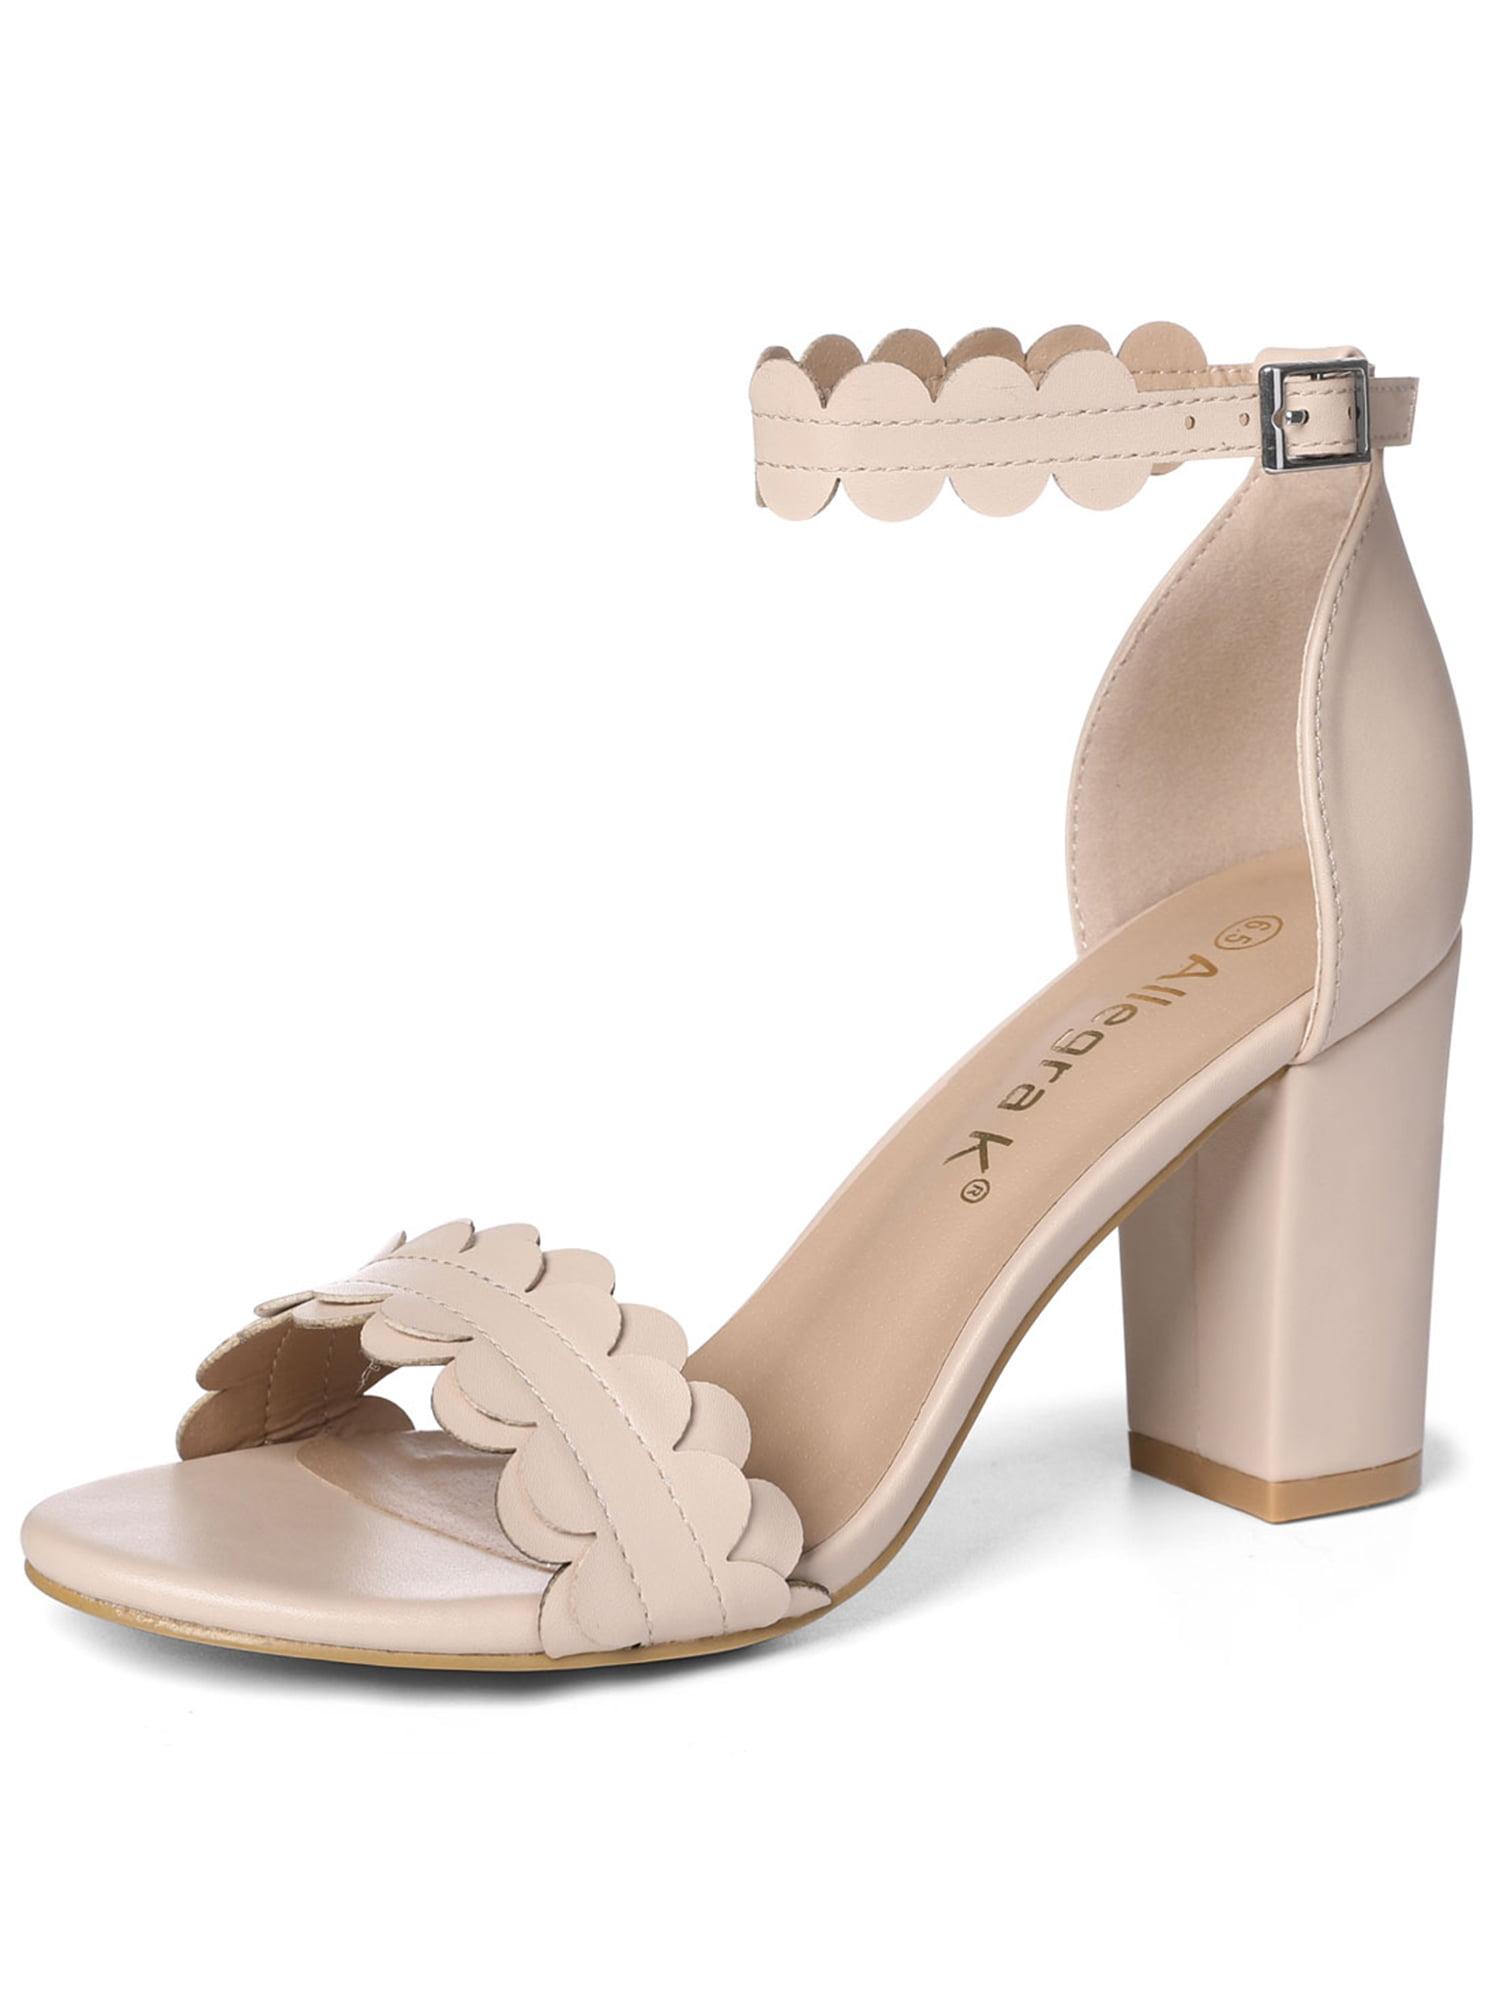 f9dd8db9945a Unique Bargains Women s Open Toe Block Heel Scalloped Ankle ...